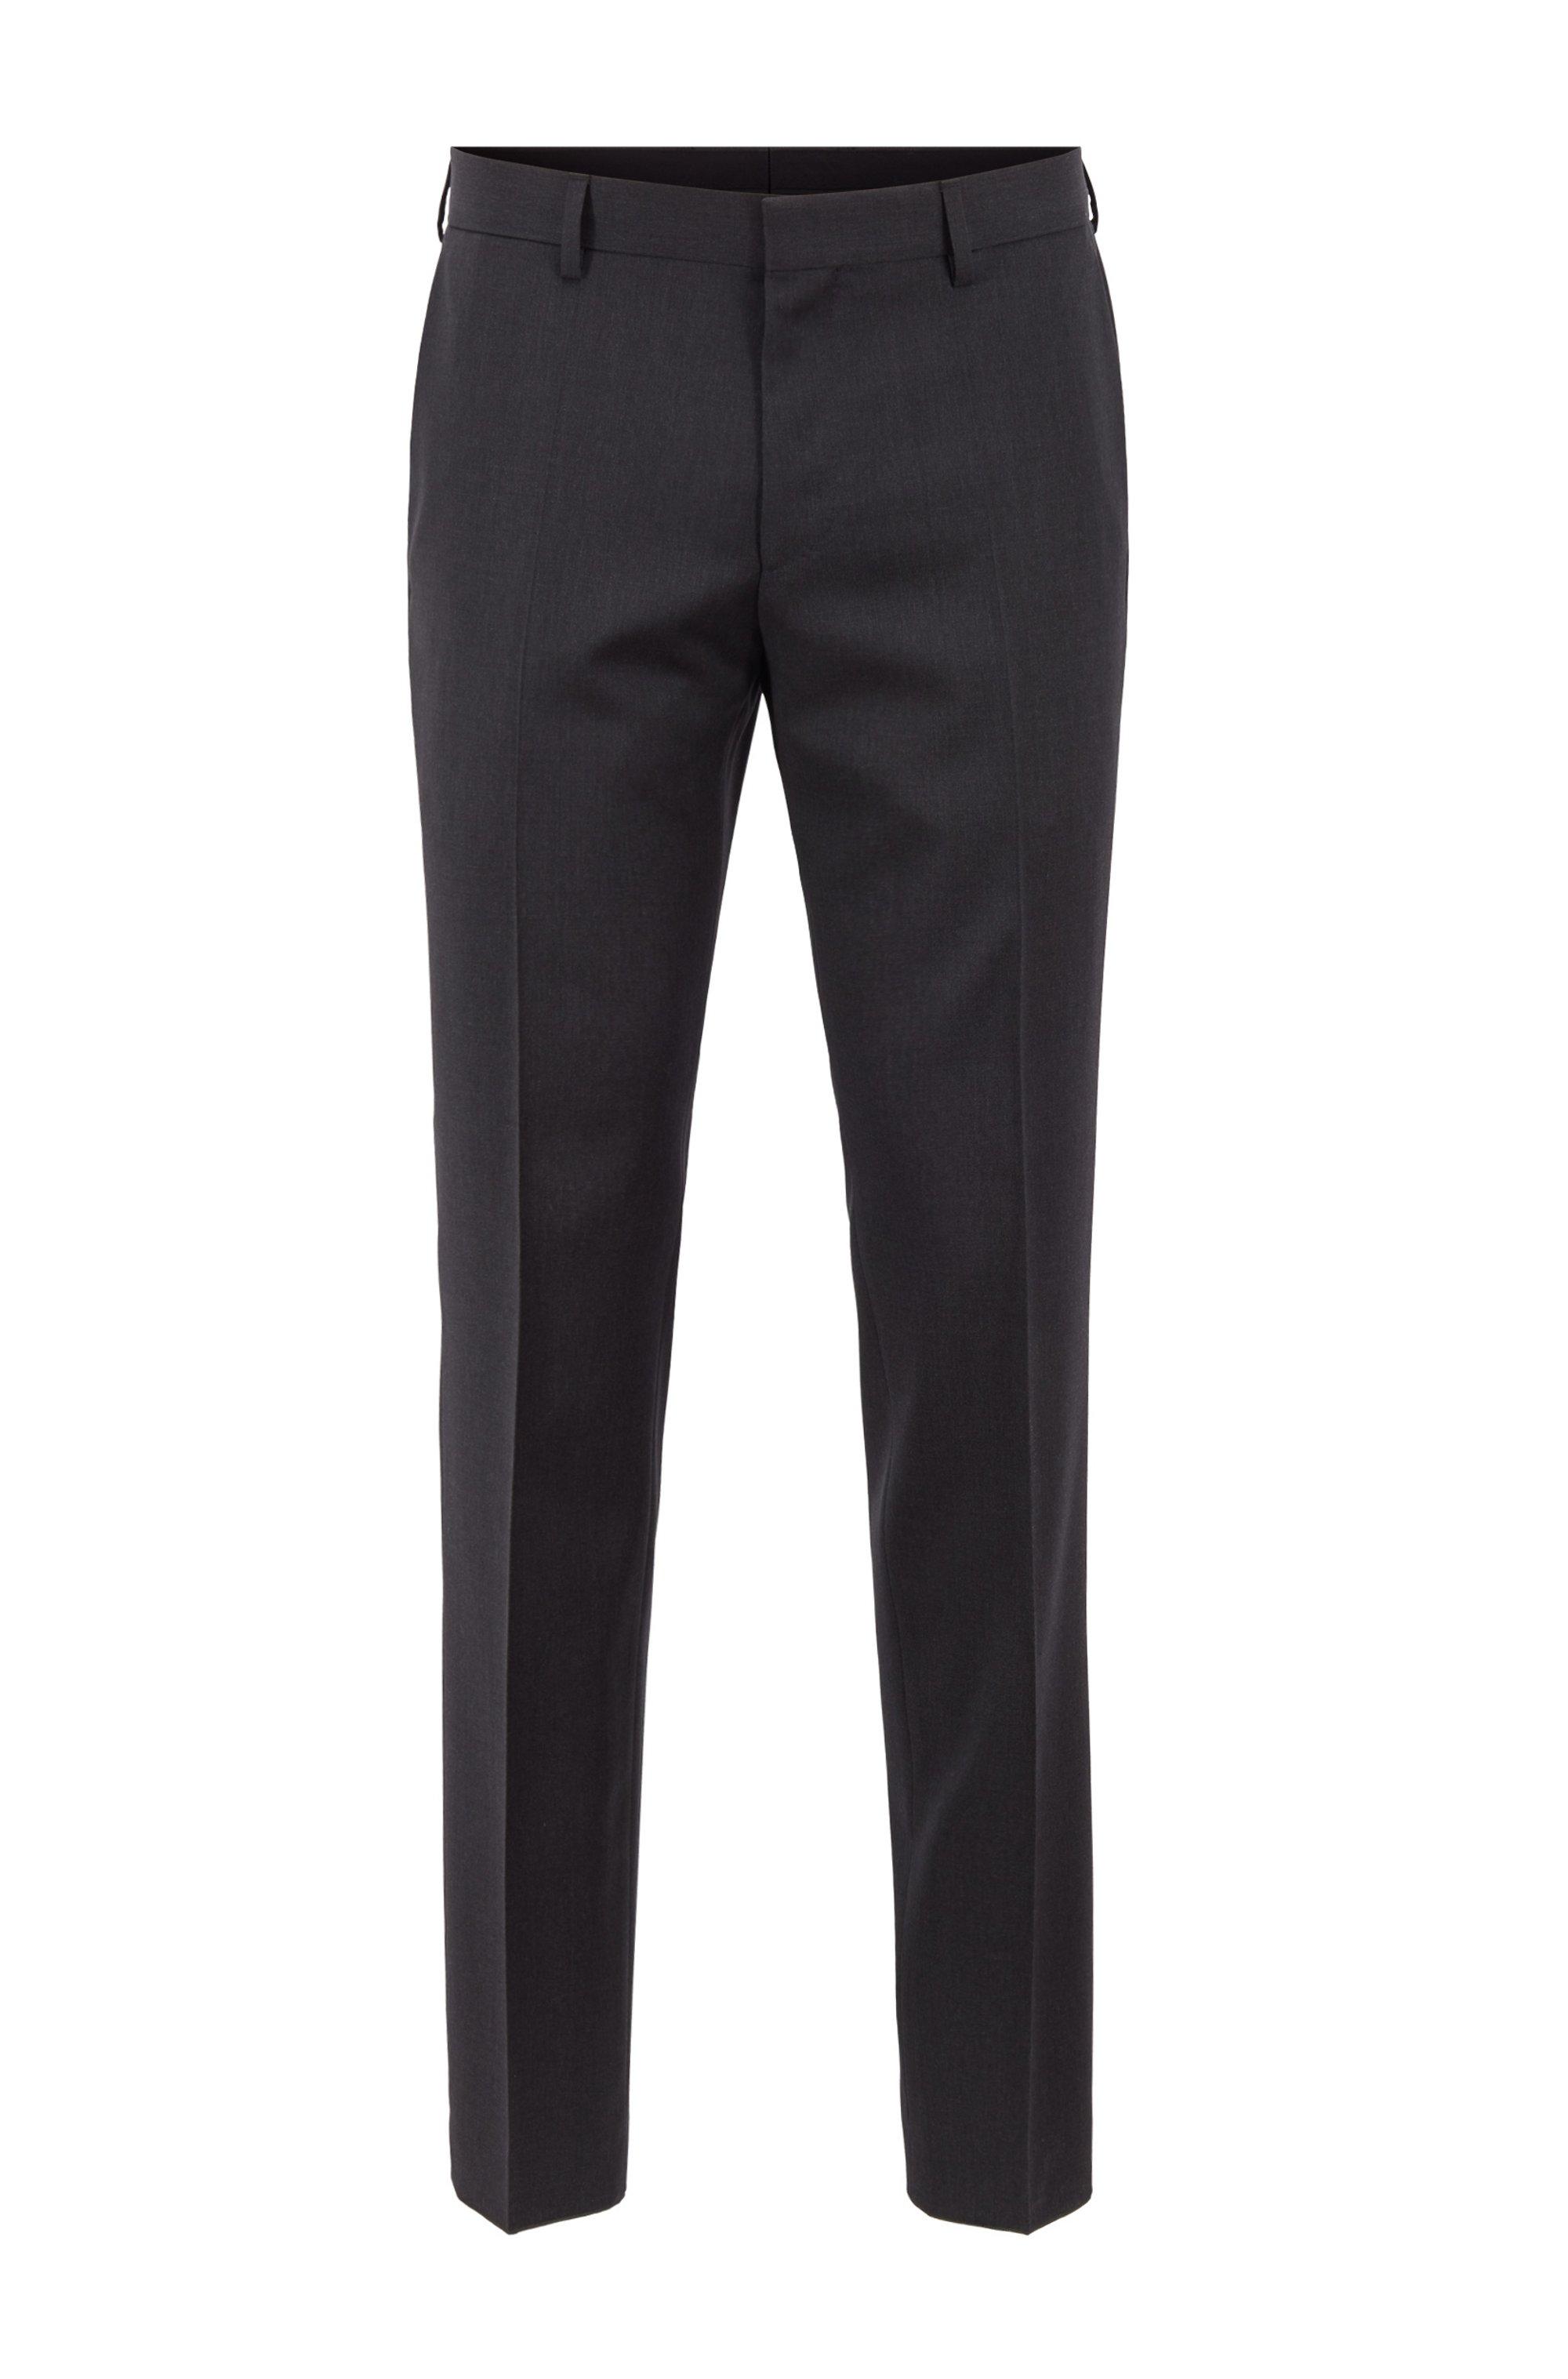 Pantalones slim fit en sarga de lana virgen, Gris oscuro